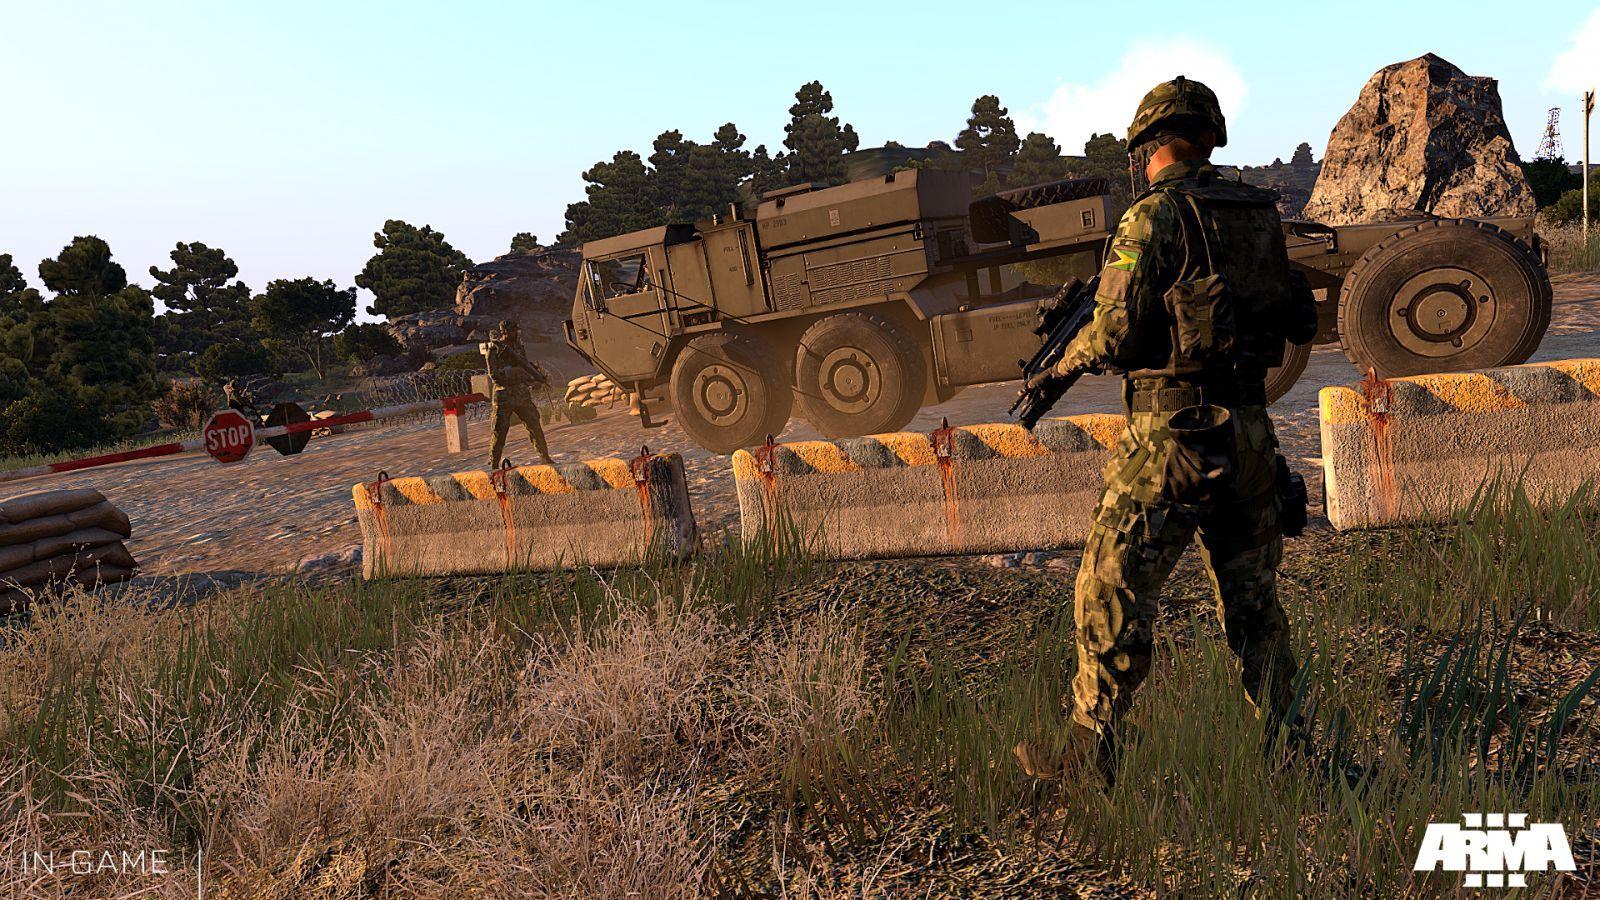 arma3 survive screenshot 02